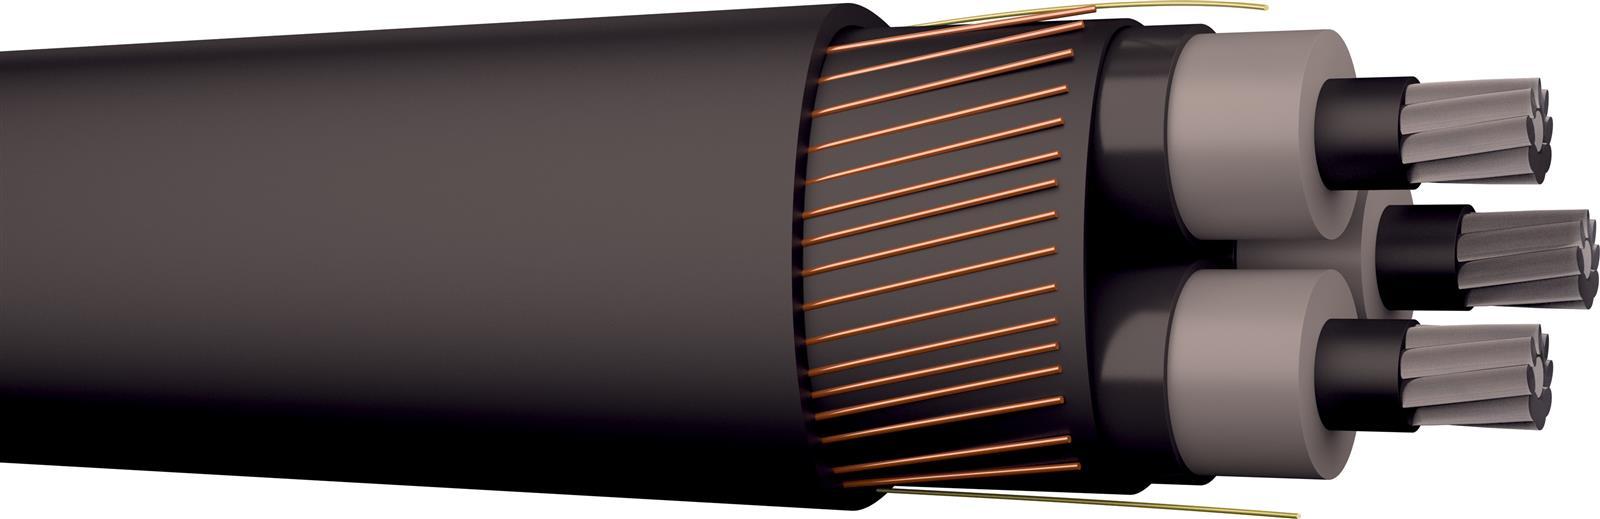 AXLJ-RMF 3X95/25 LT 12KV